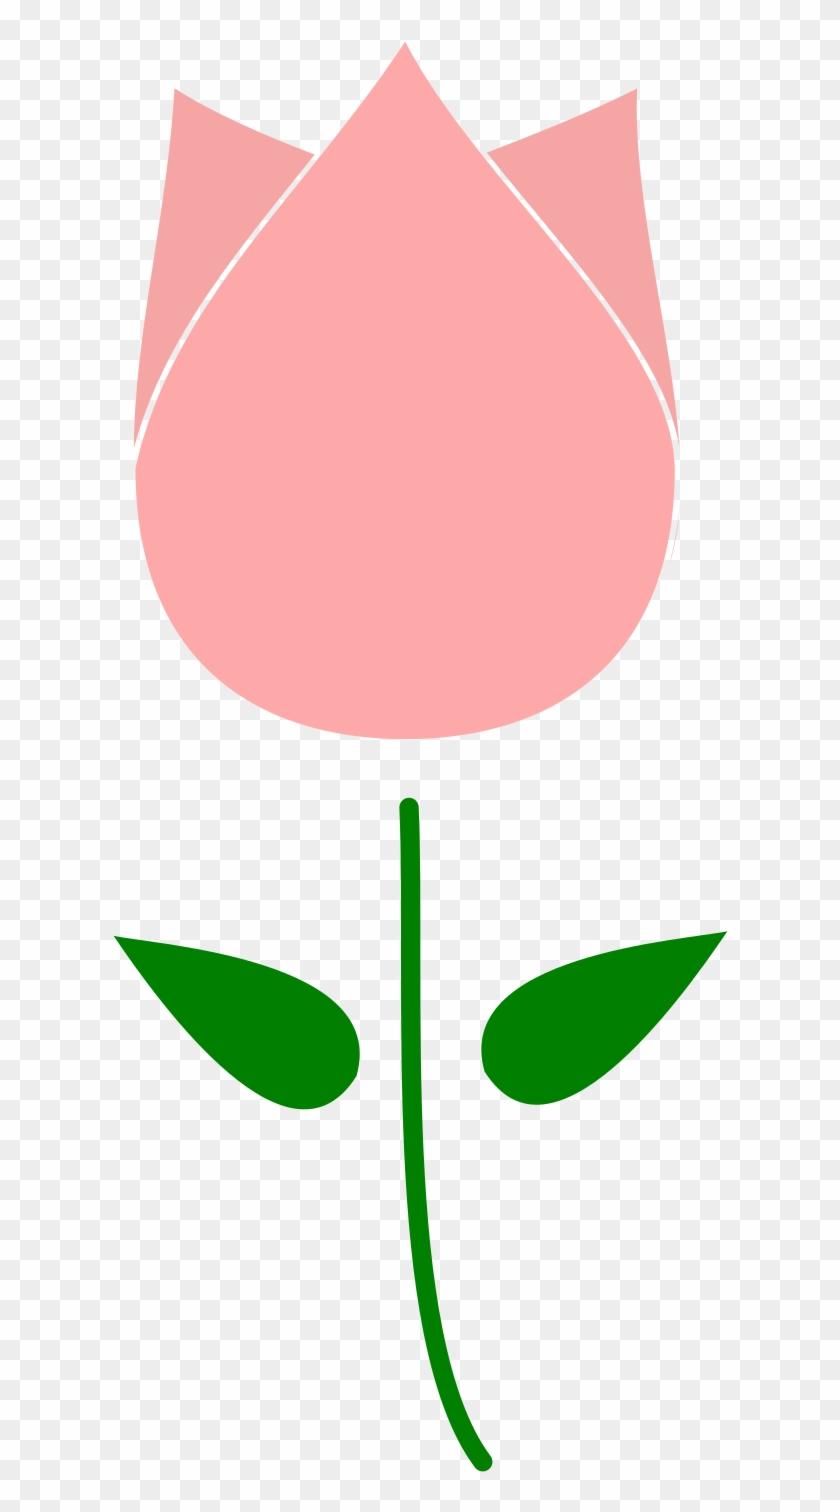 Clipart Tulip Flower - Psd #95992